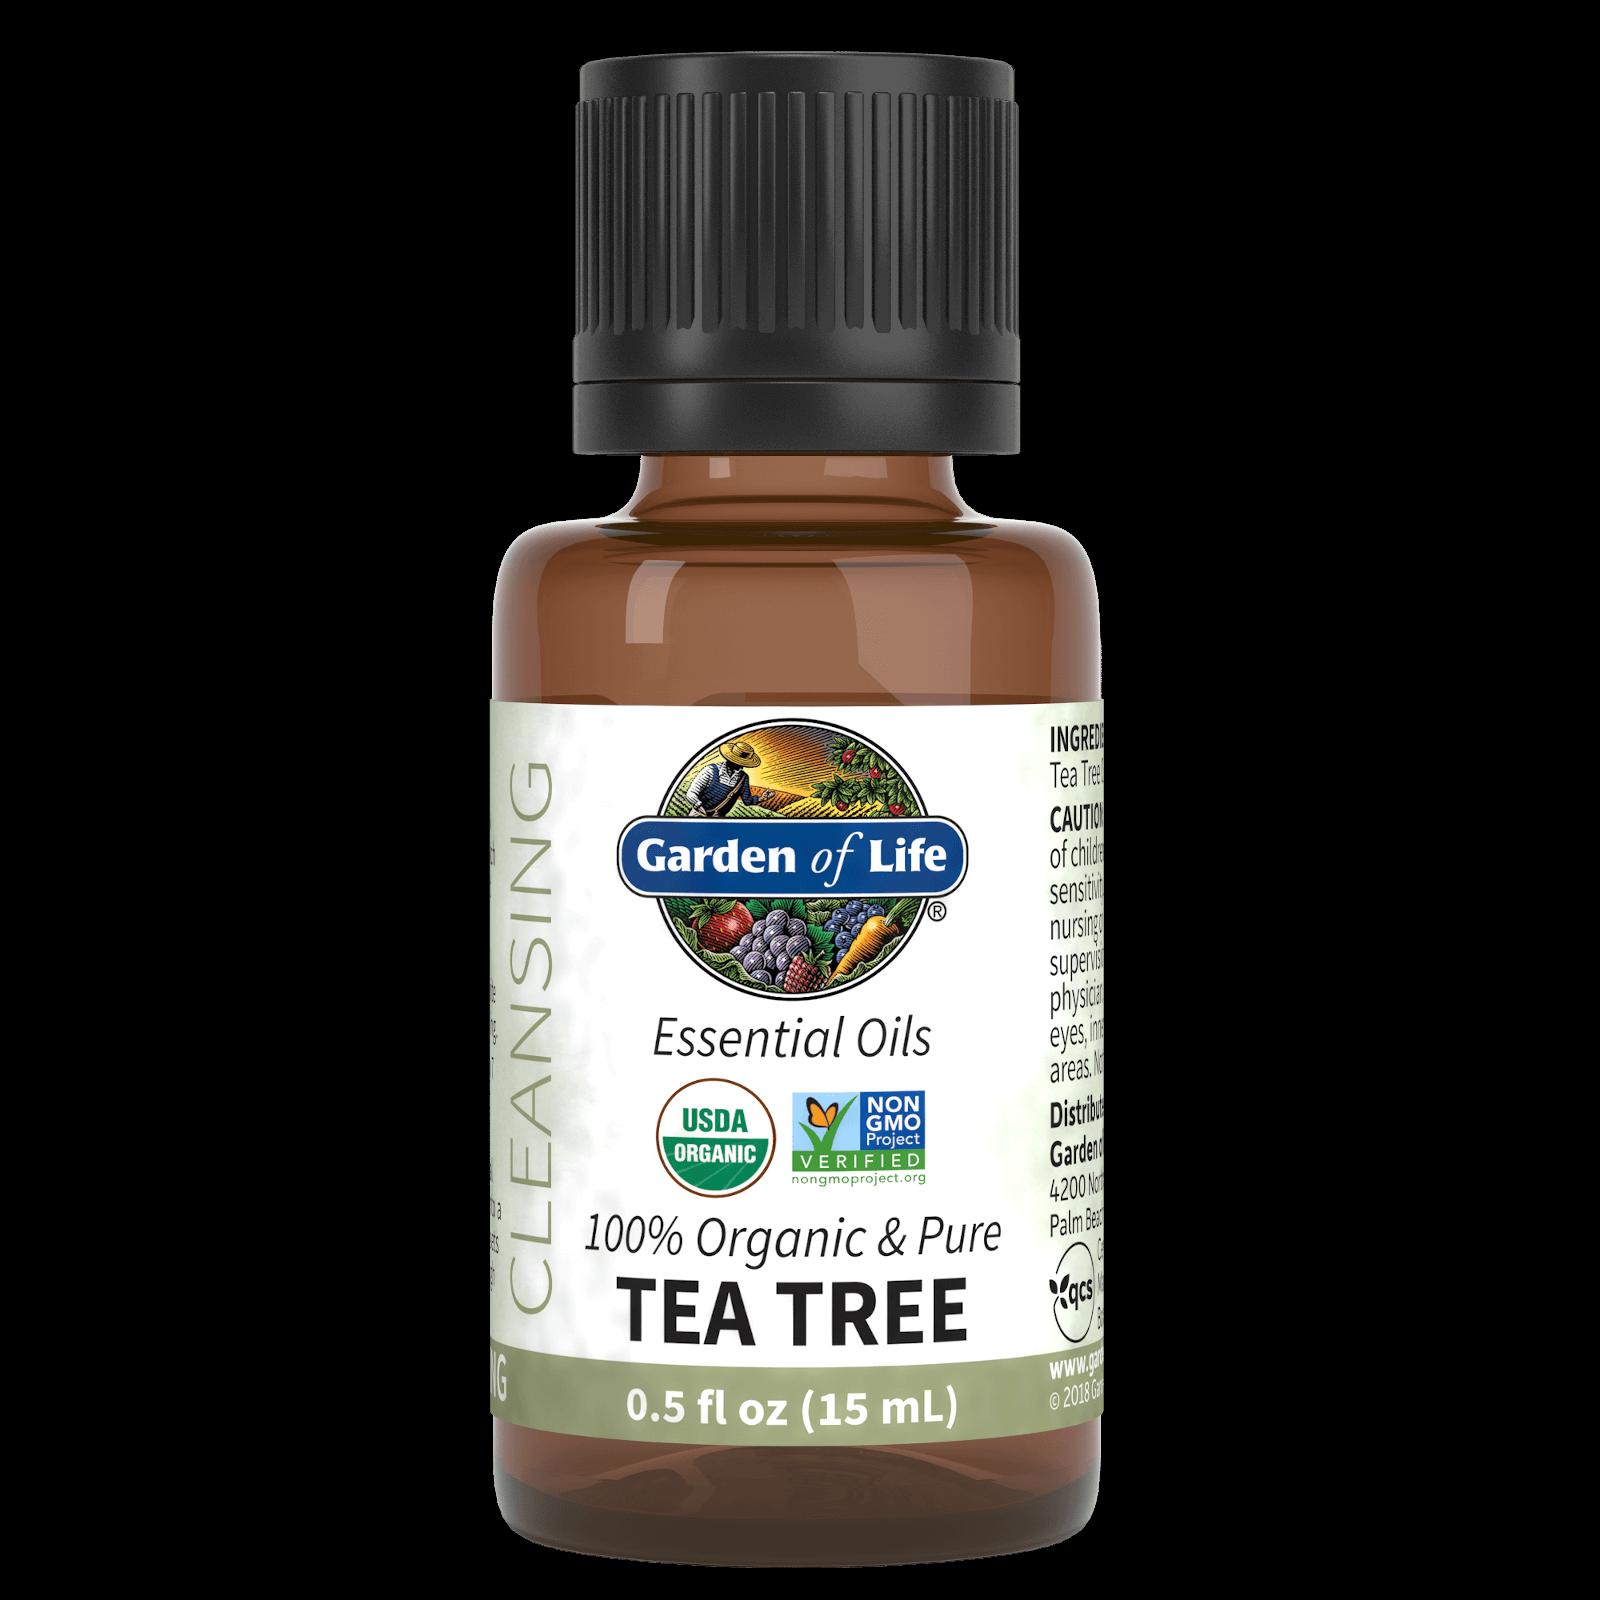 Garden of Life Organic Essential Oil - Tea Tree - 15ml